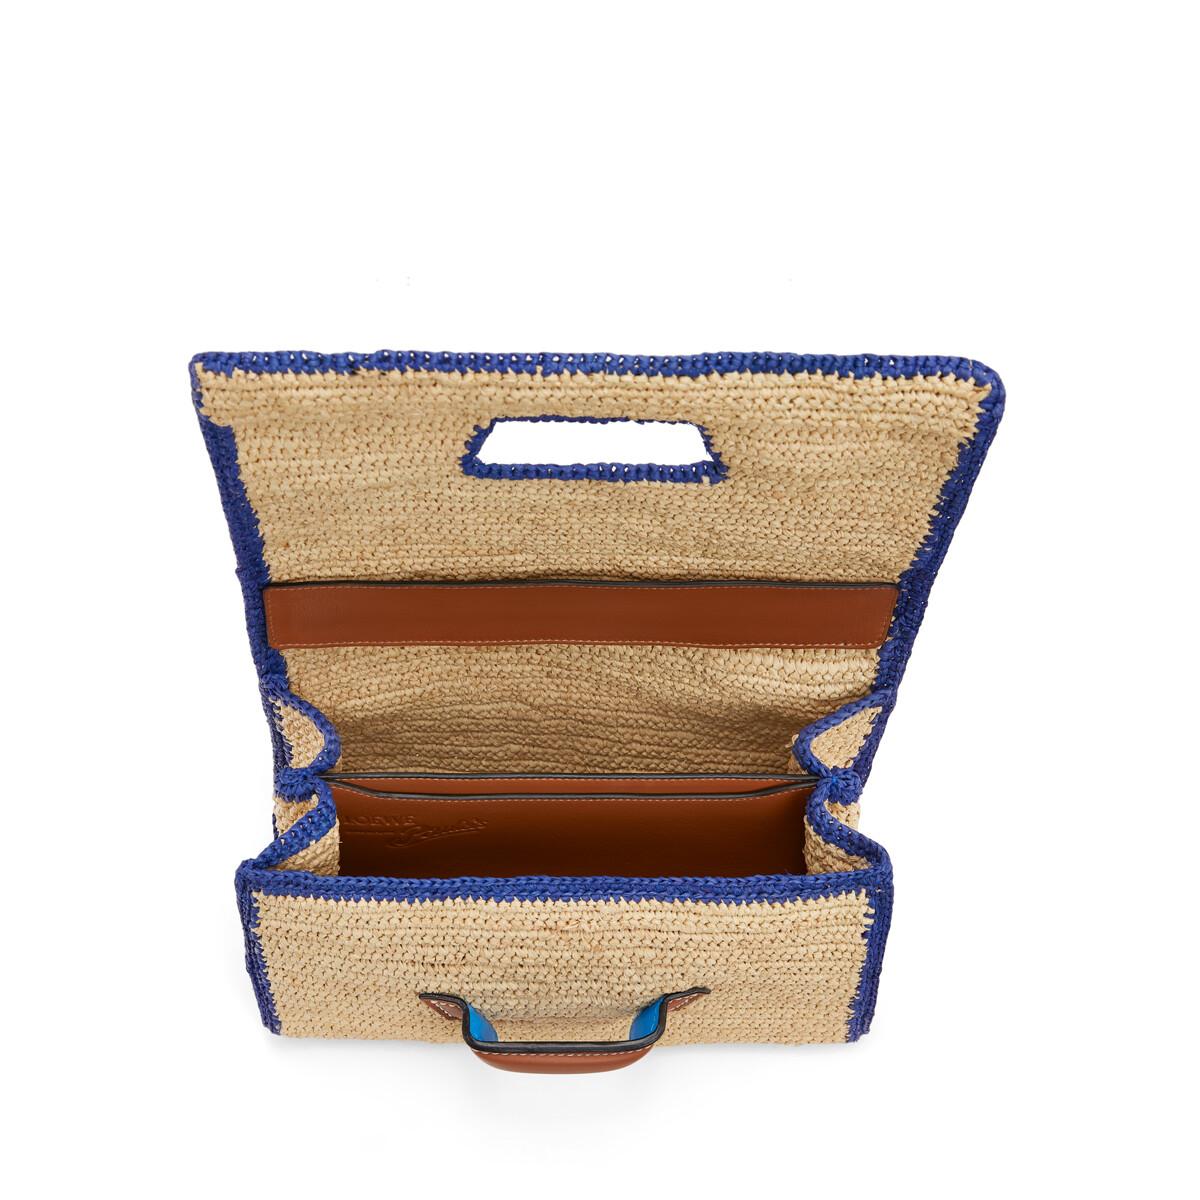 LOEWE Paula's Barcelona Bag Natural/Blue front